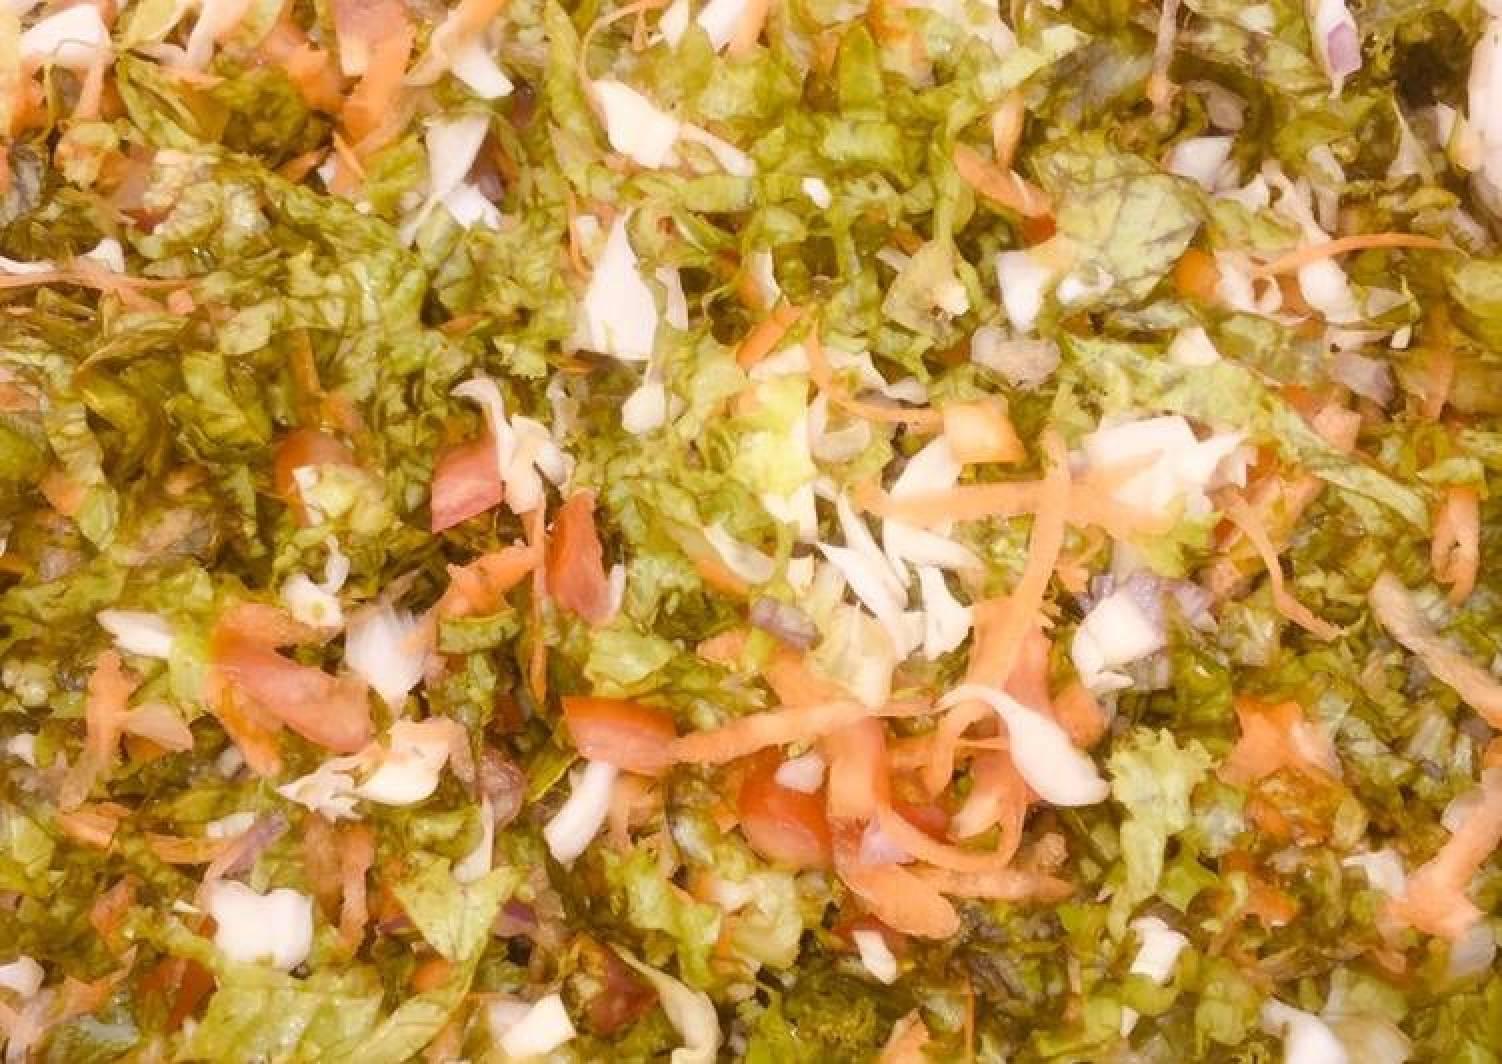 Lettuce mixed wit veggies